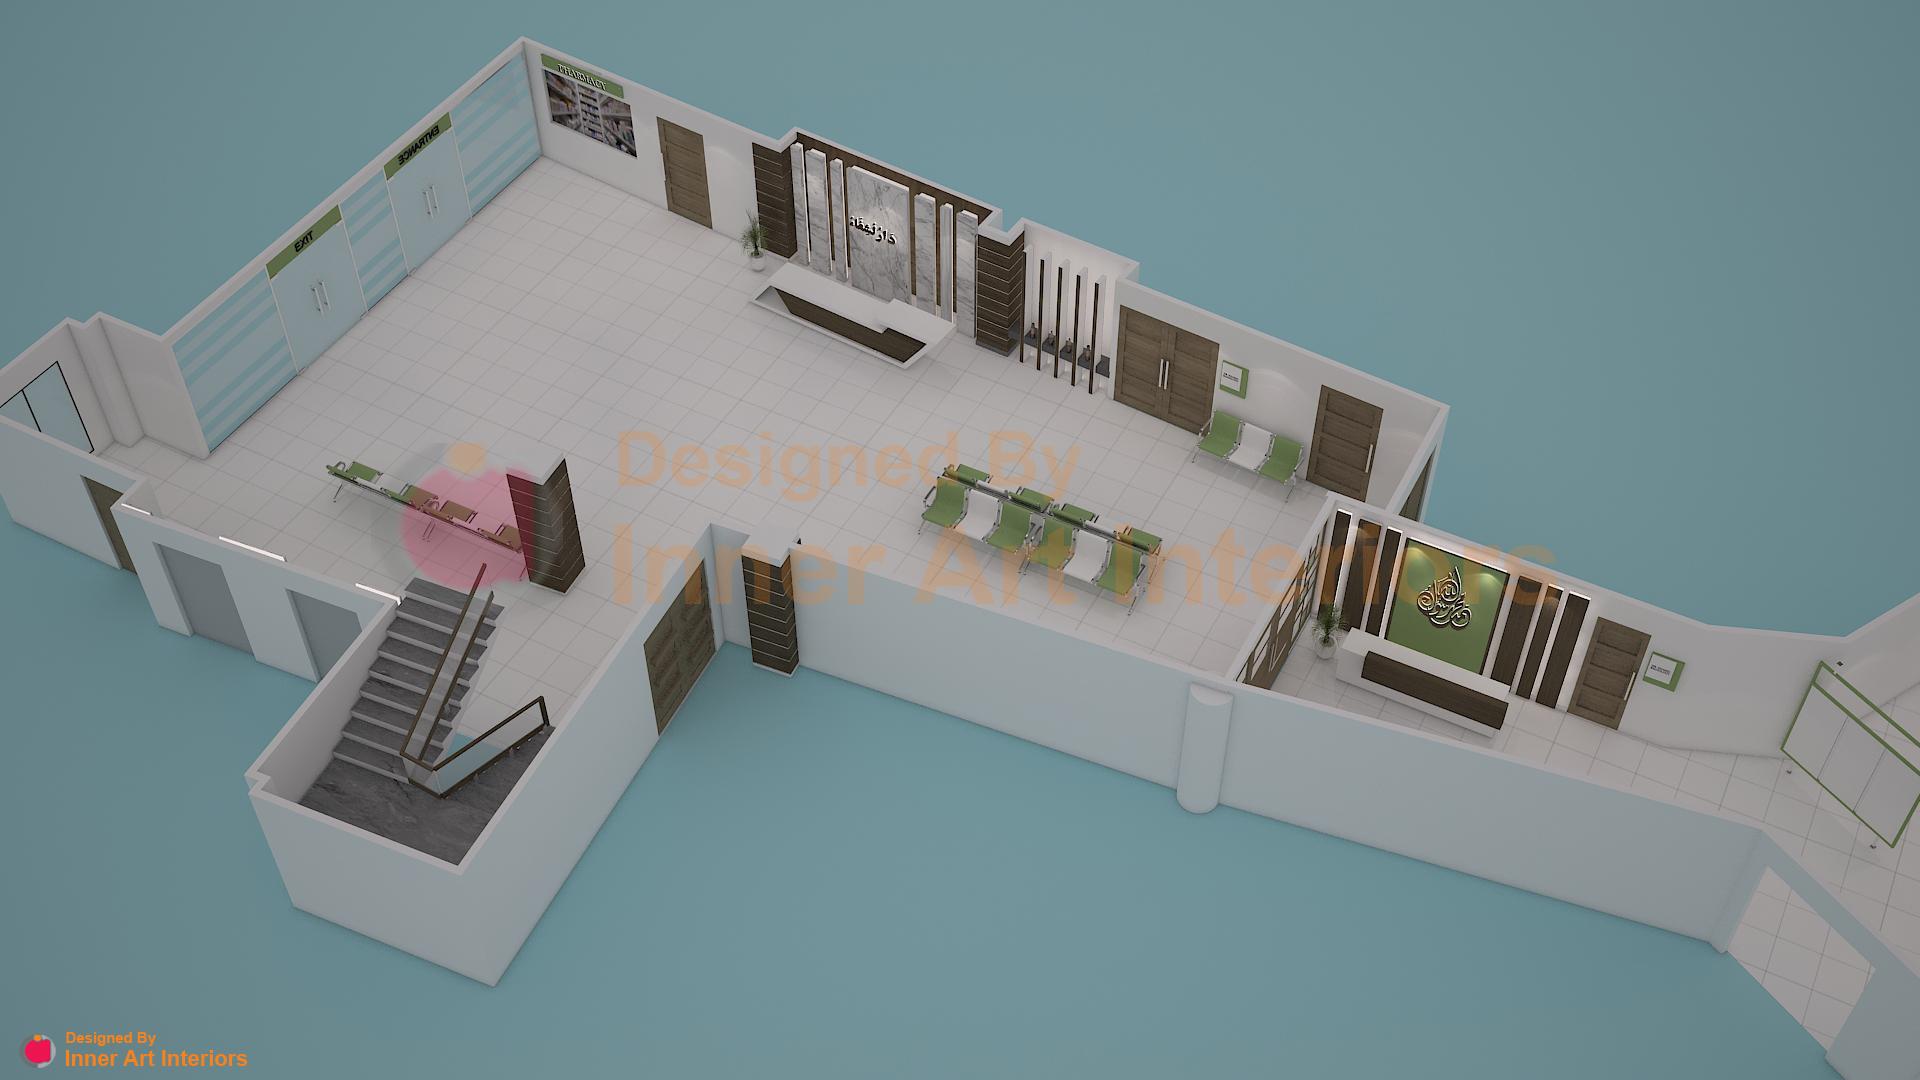 DAR-UL -SHIFA hospital